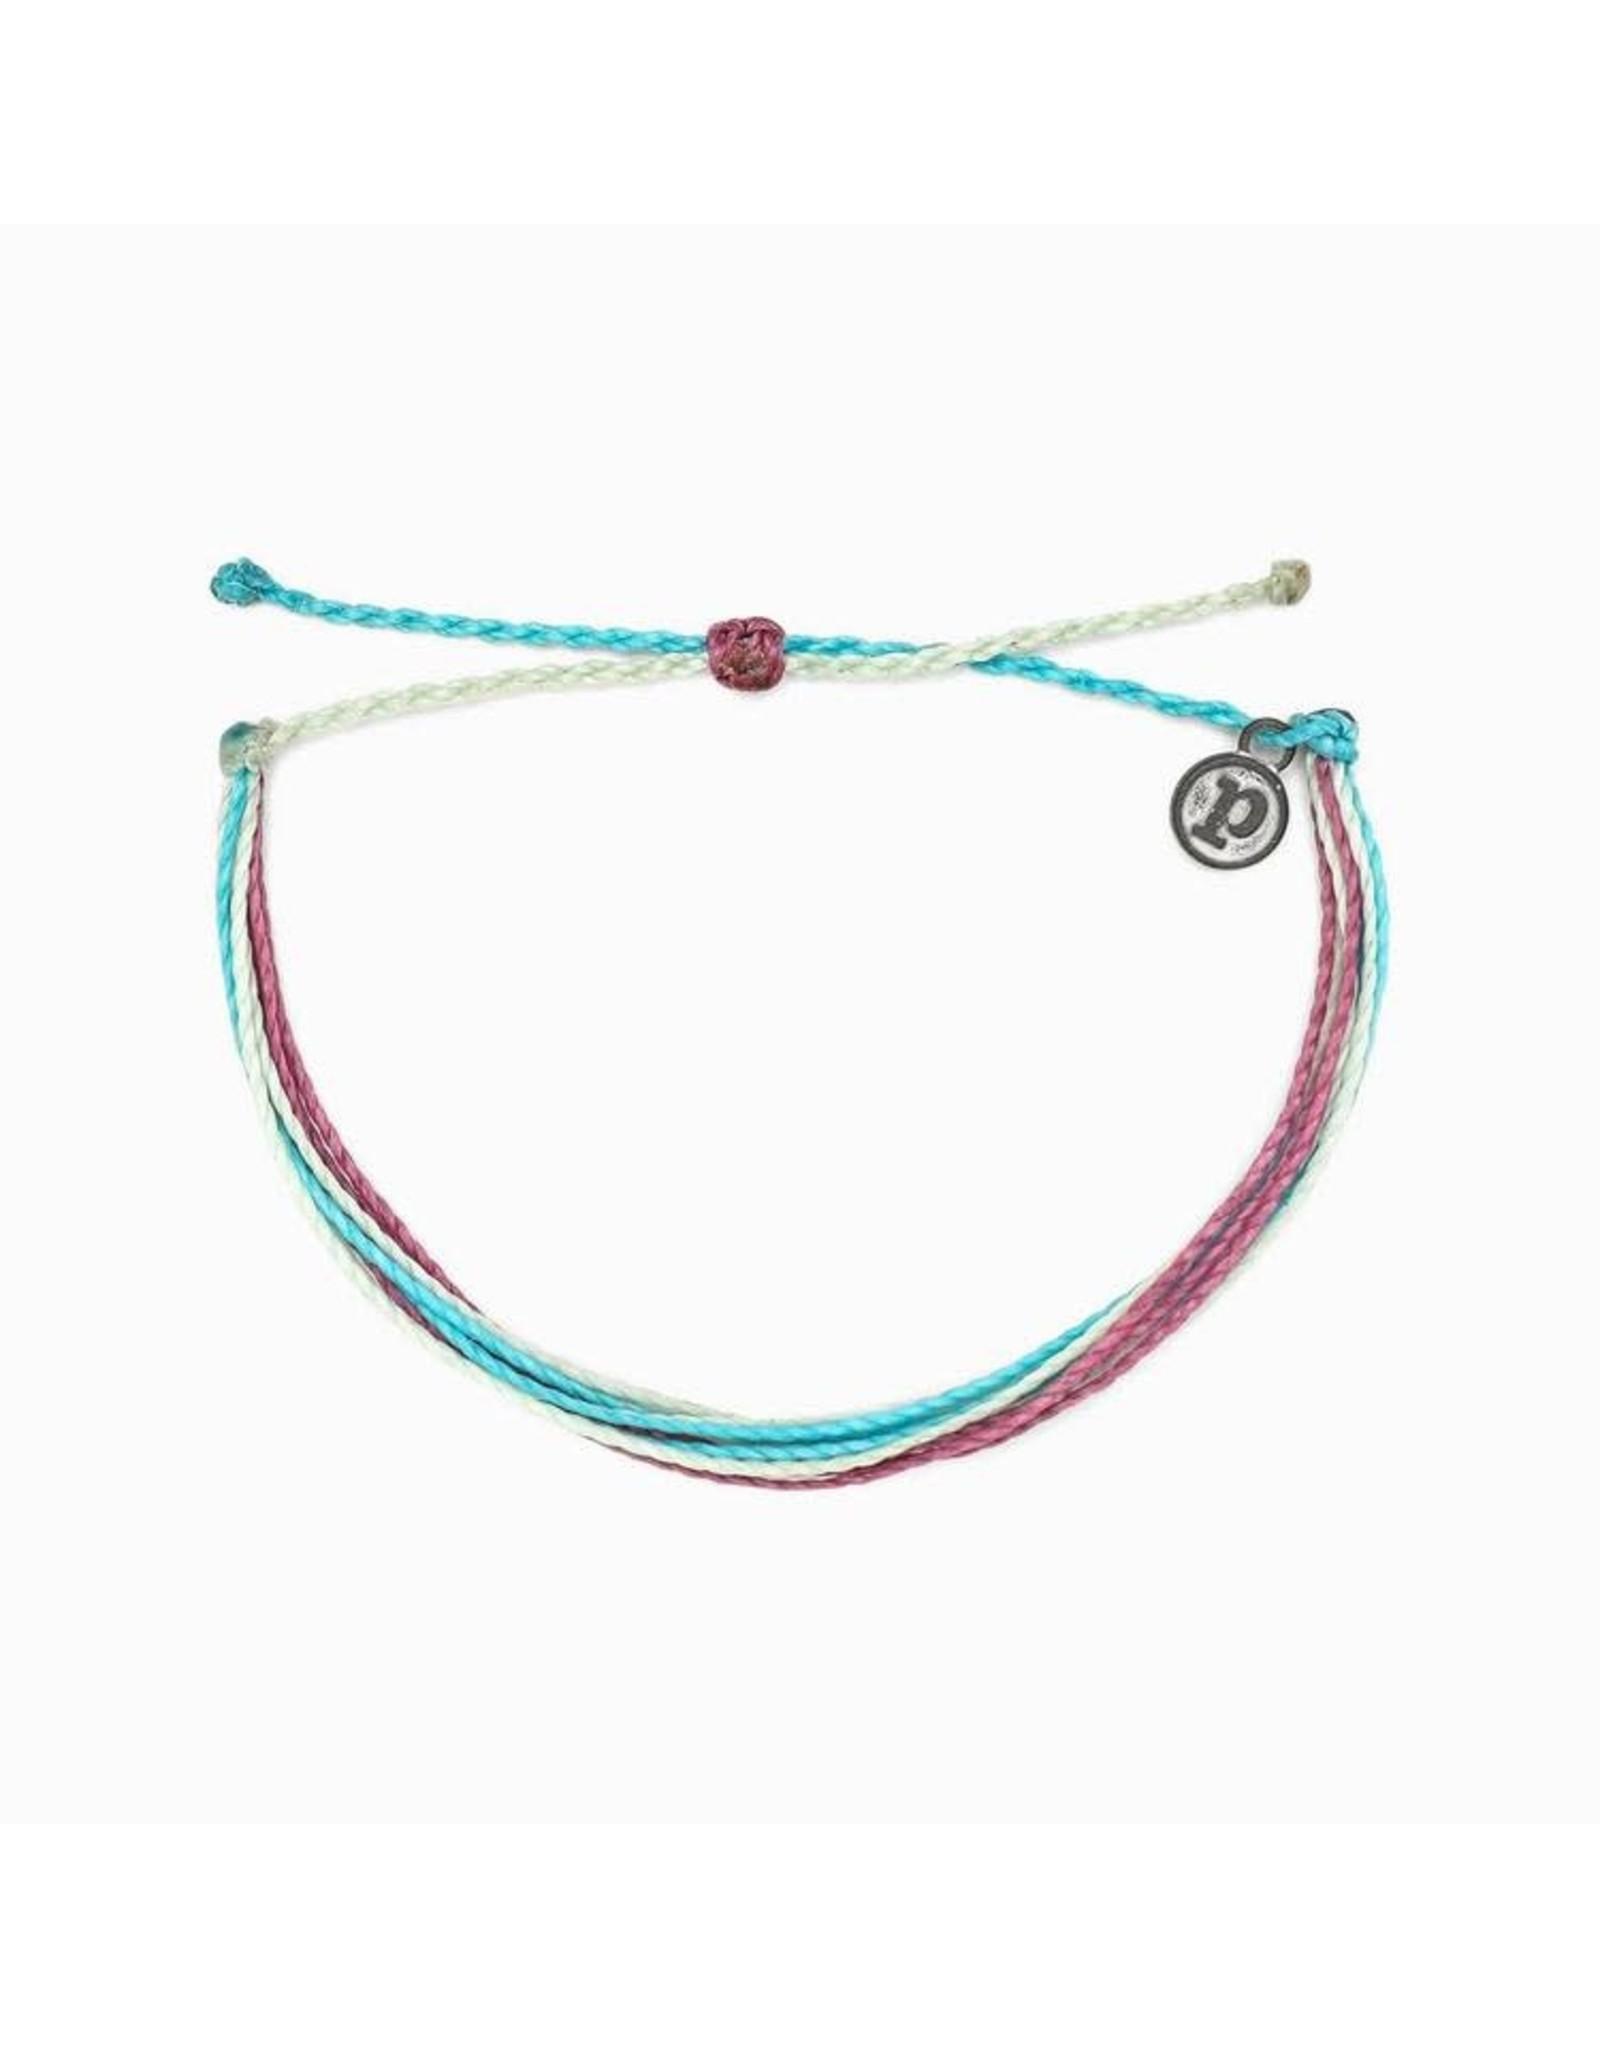 Puravida Bracelets Bright Original Good Vibes